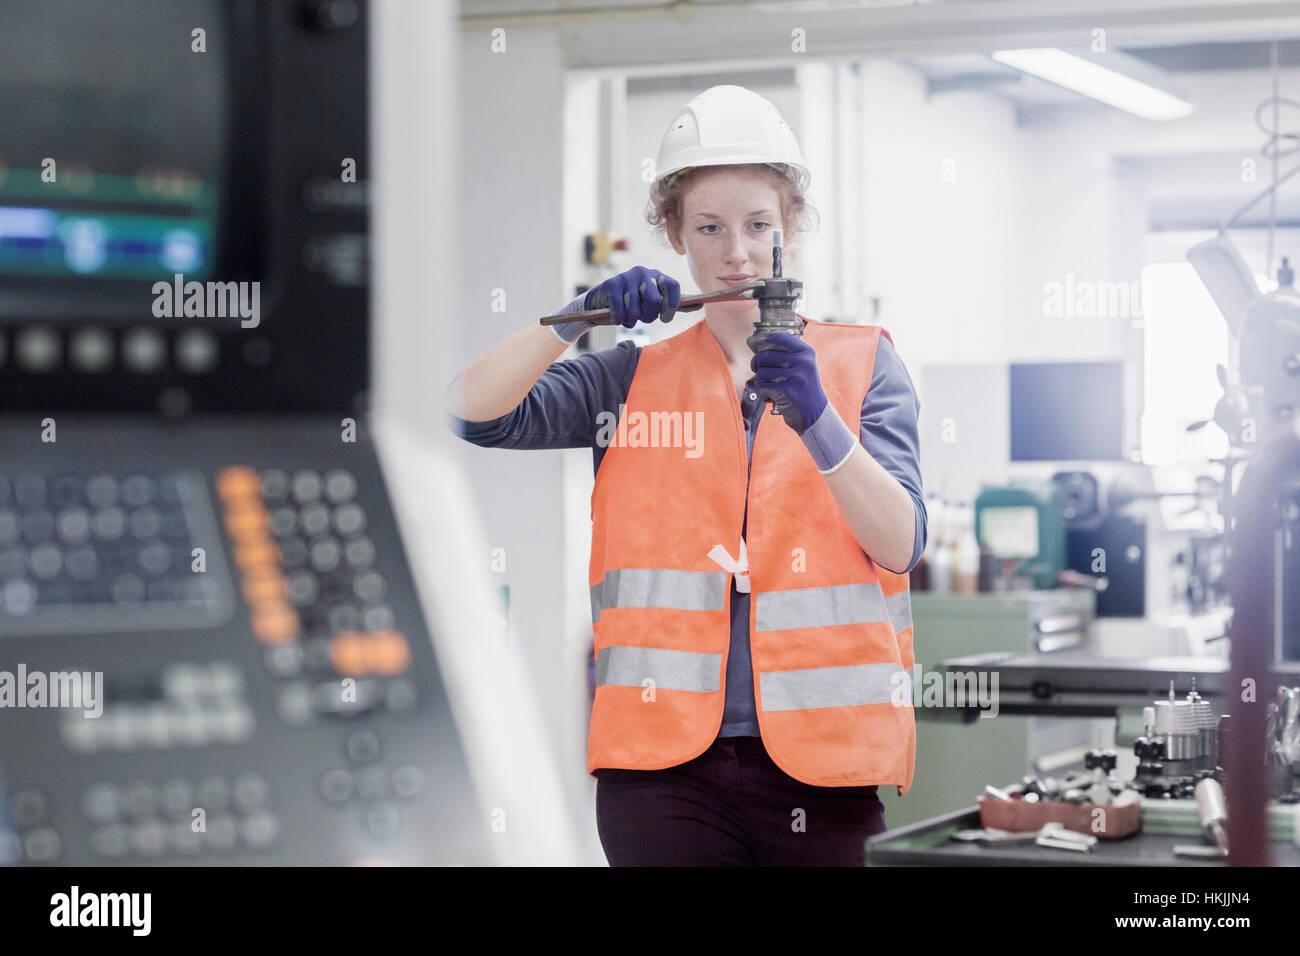 Young female engineer repairing machine part in an industrial plant, Freiburg im Breisgau, Baden-Württemberg, - Stock Image